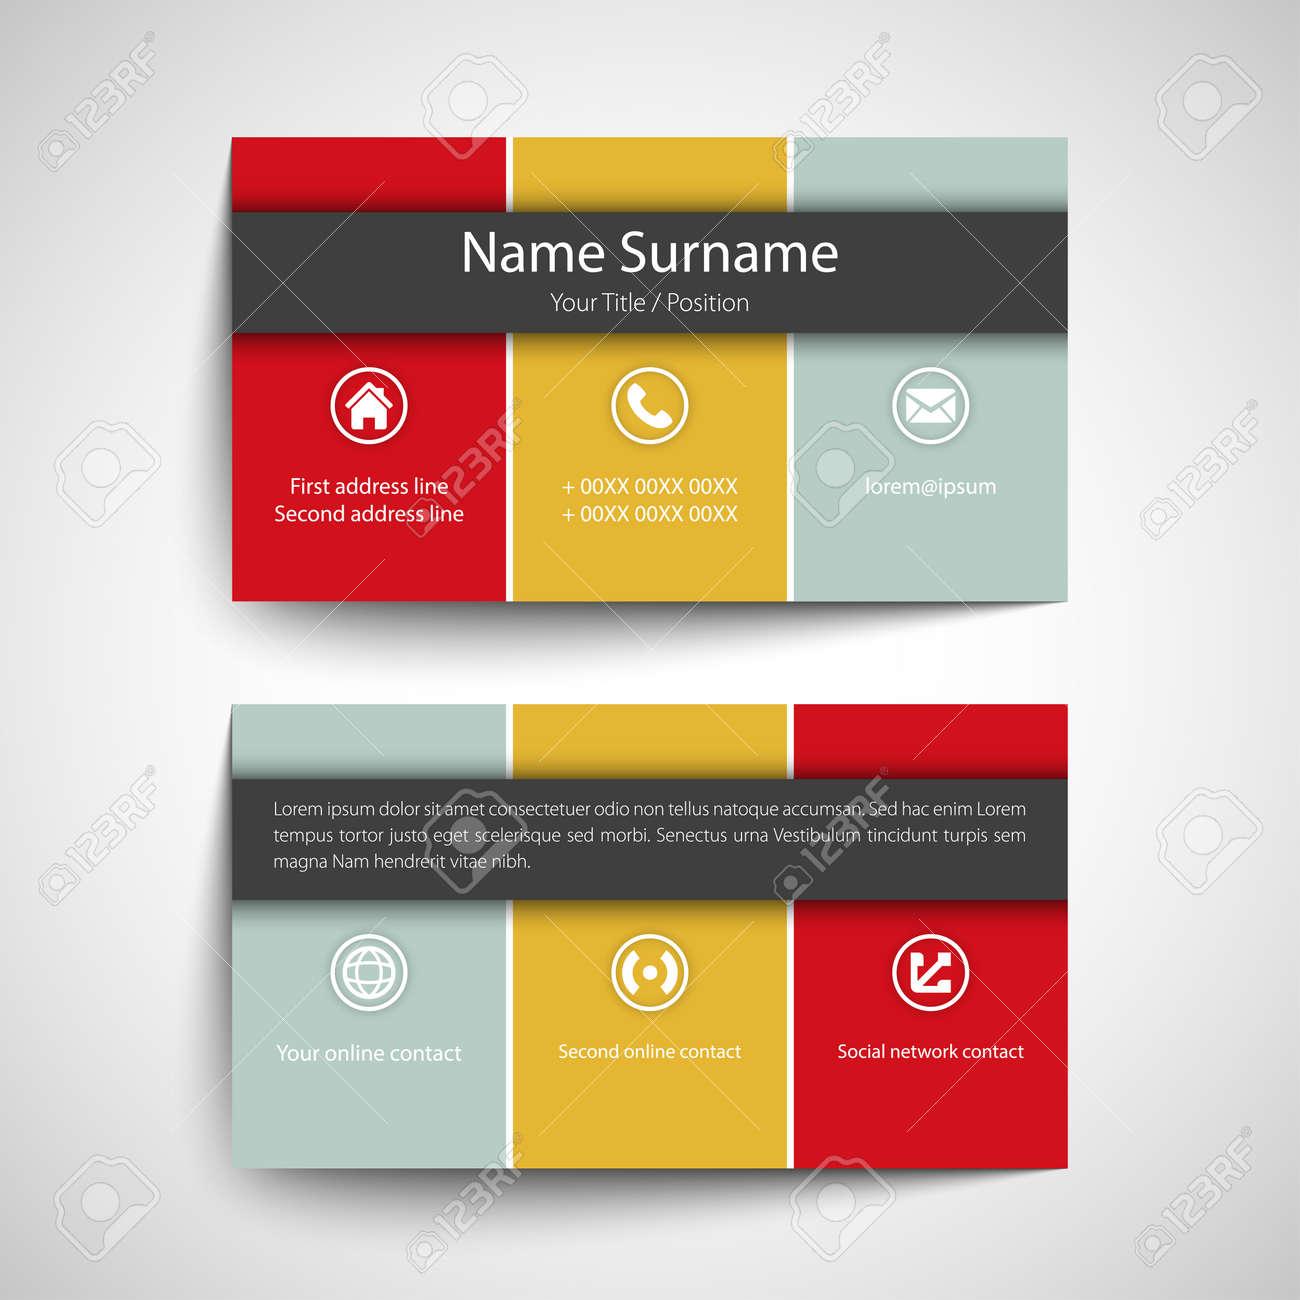 Modern simple business card set template or visiting card vector modern simple business card set template or visiting card vector illustration stock vector colourmoves